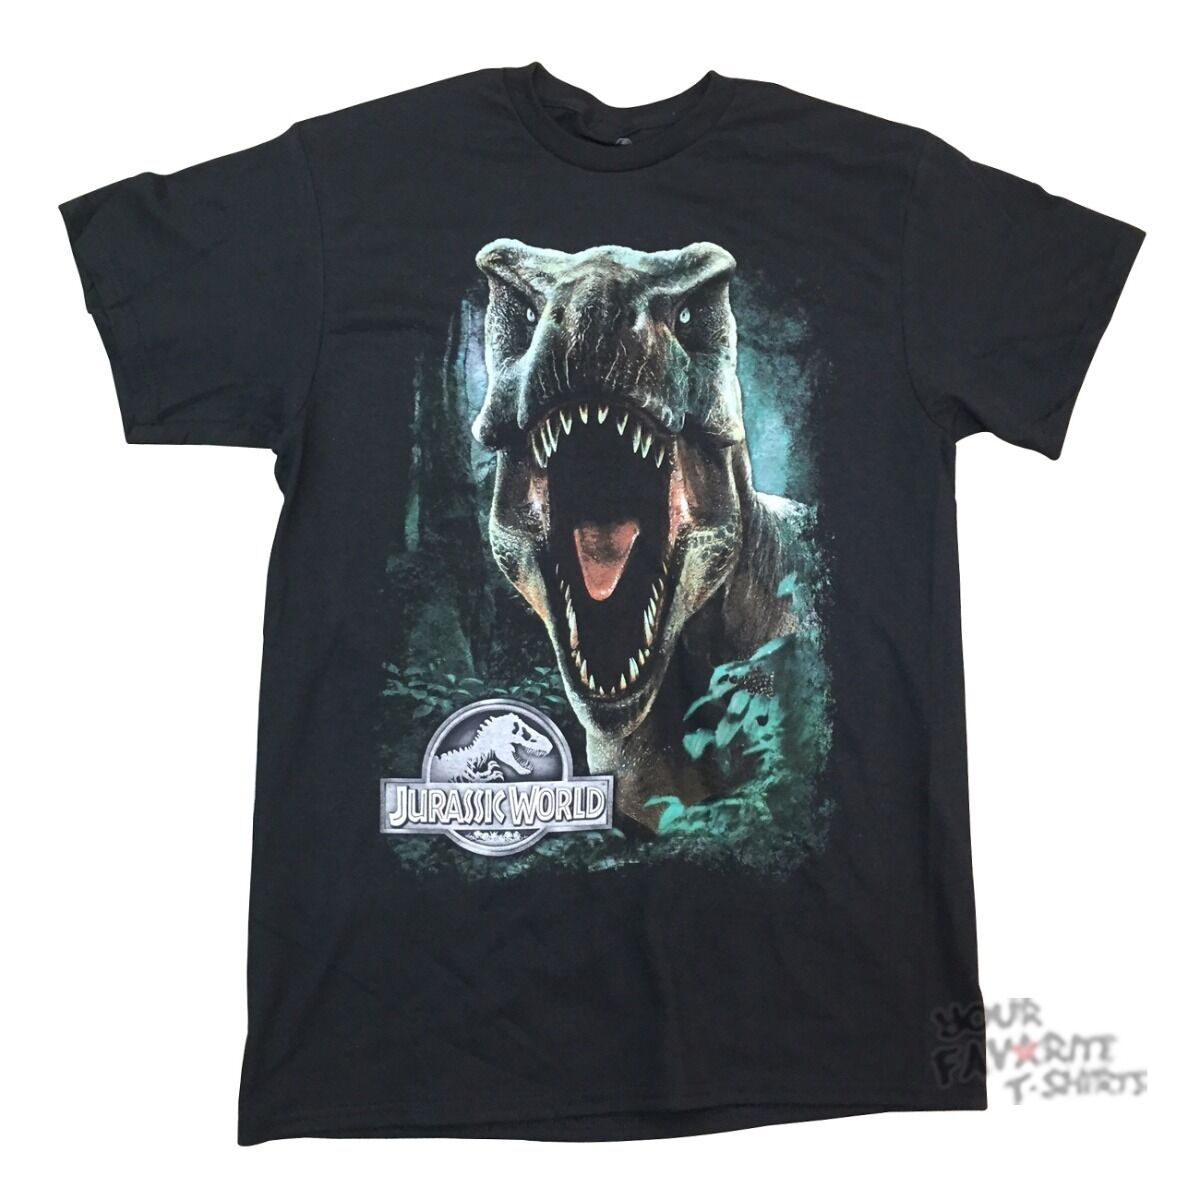 10 Set Id Jurassic World Movie Rex Park Licensed Adult Shirt Xxl